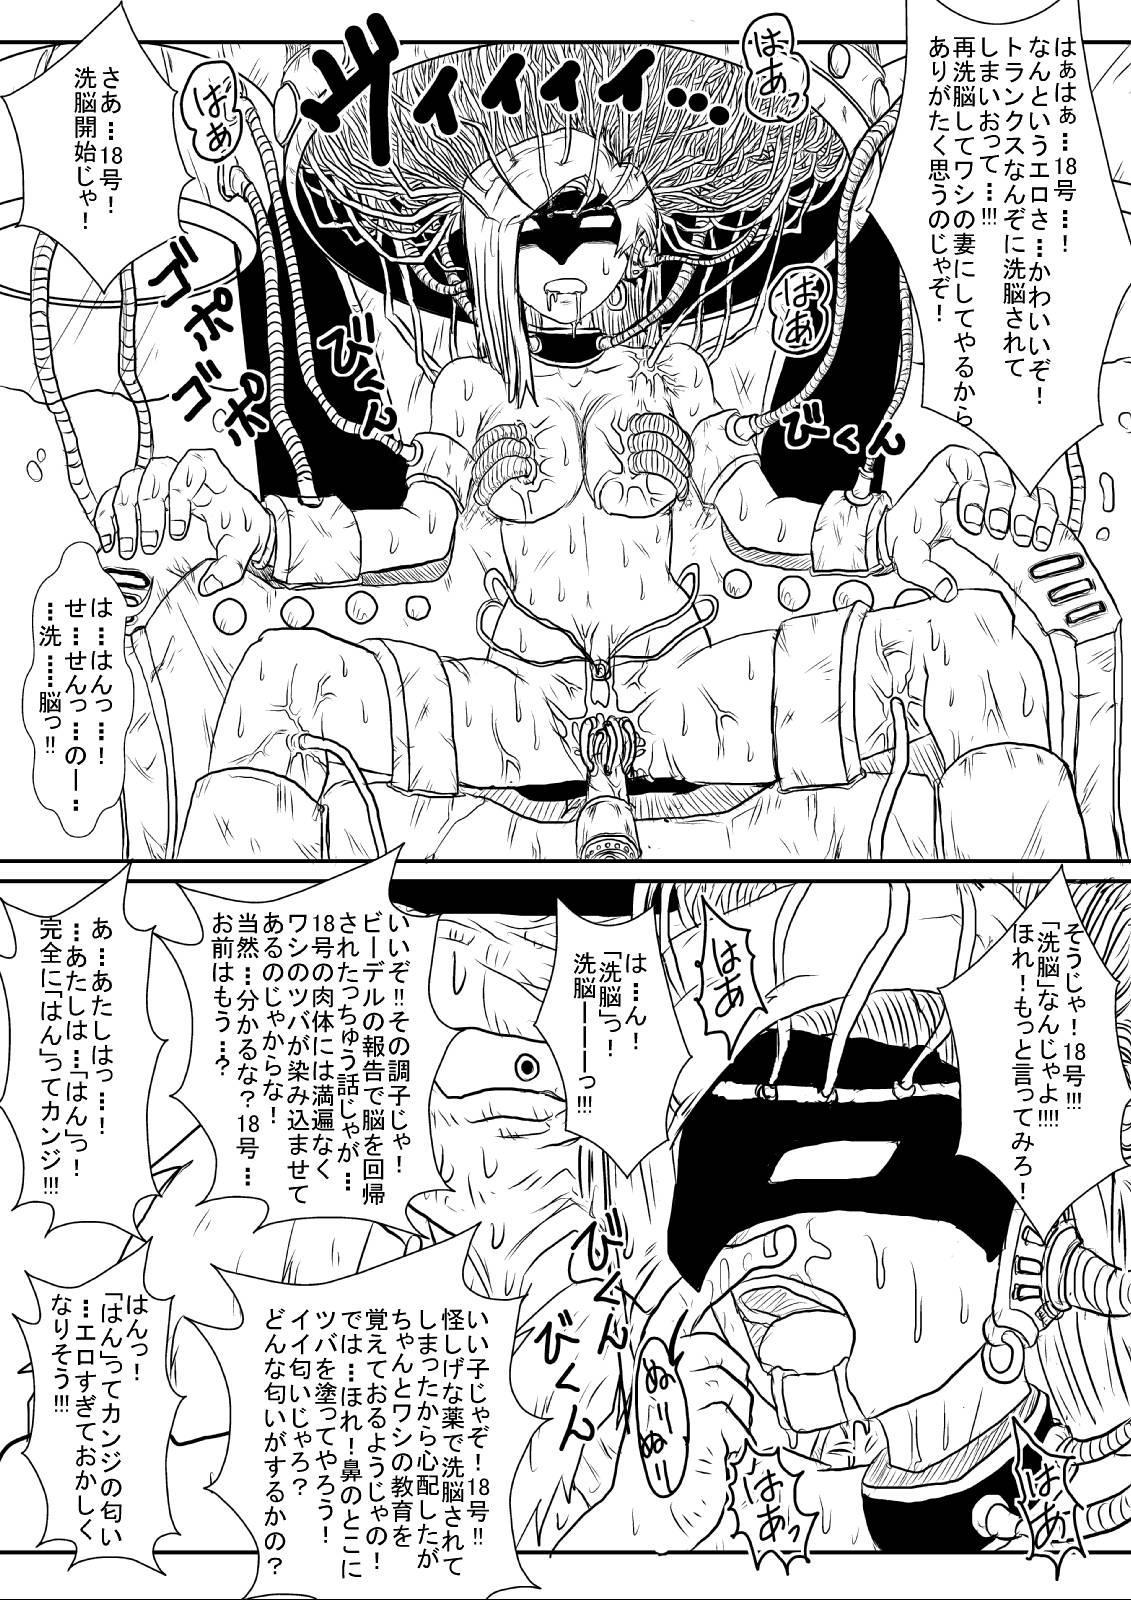 [Alice.Blood] Sennou Kyouiku-shitsu~ Jinzou ☆-kan 18-gou-hen (Dragon Ball Z) 26